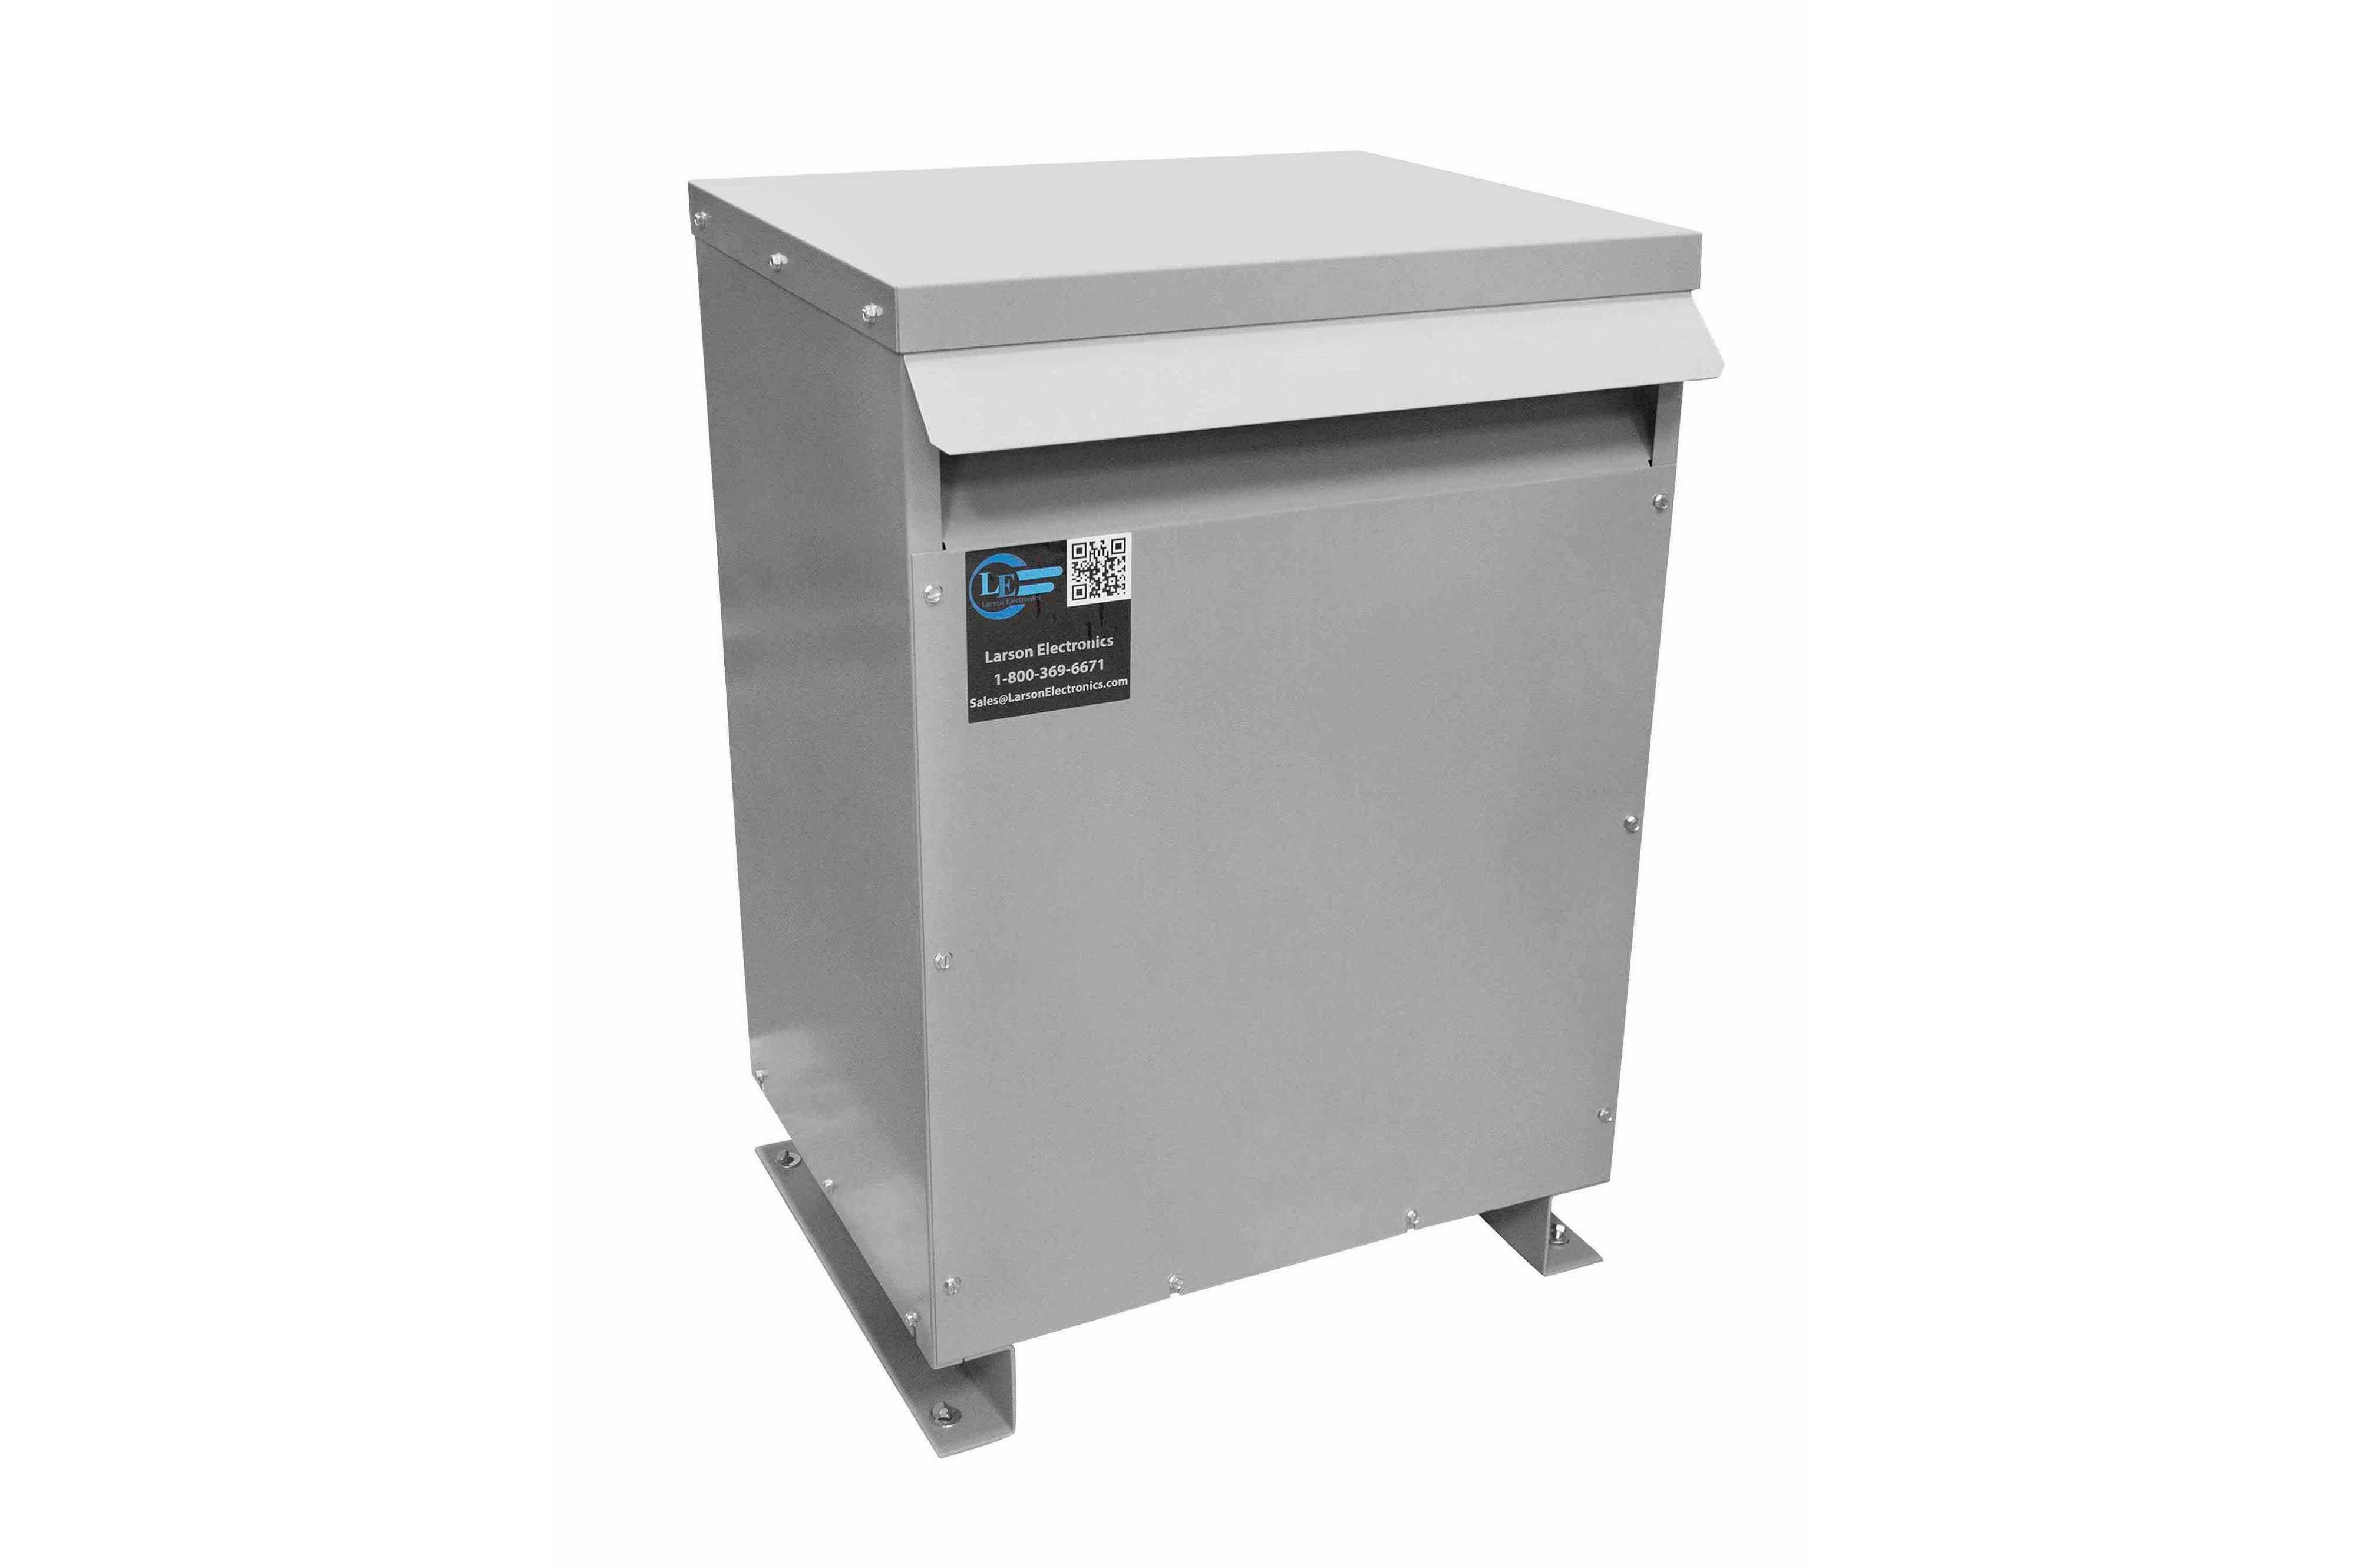 700 kVA 3PH DOE Transformer, 230V Delta Primary, 480Y/277 Wye-N Secondary, N3R, Ventilated, 60 Hz